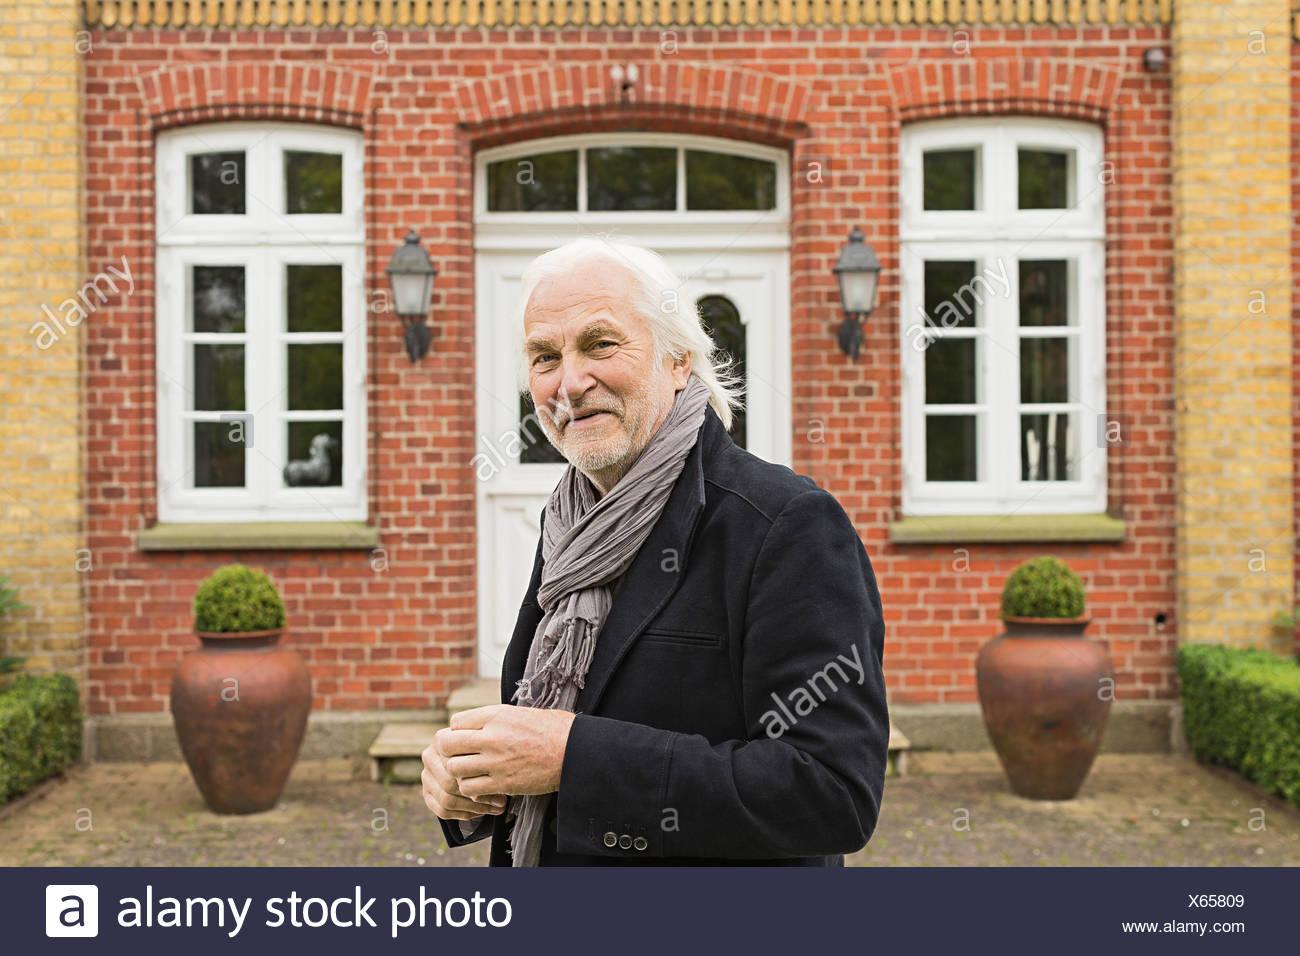 Portrait of senior man wearing jacket and scarf outside house - Stock Image